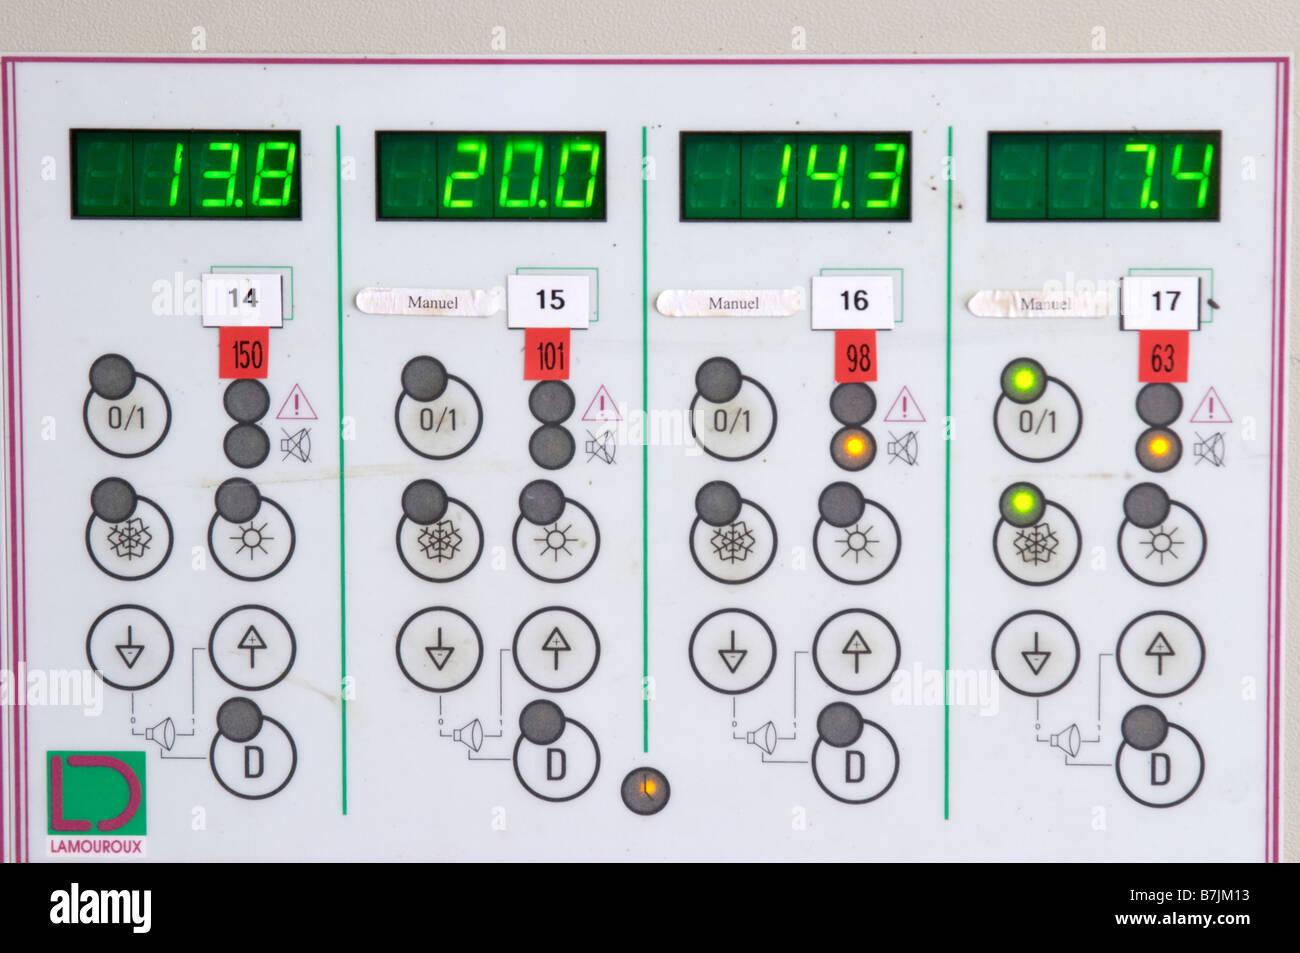 Control panel for temperature control chateau lestrille bordeaux france - Stock Image